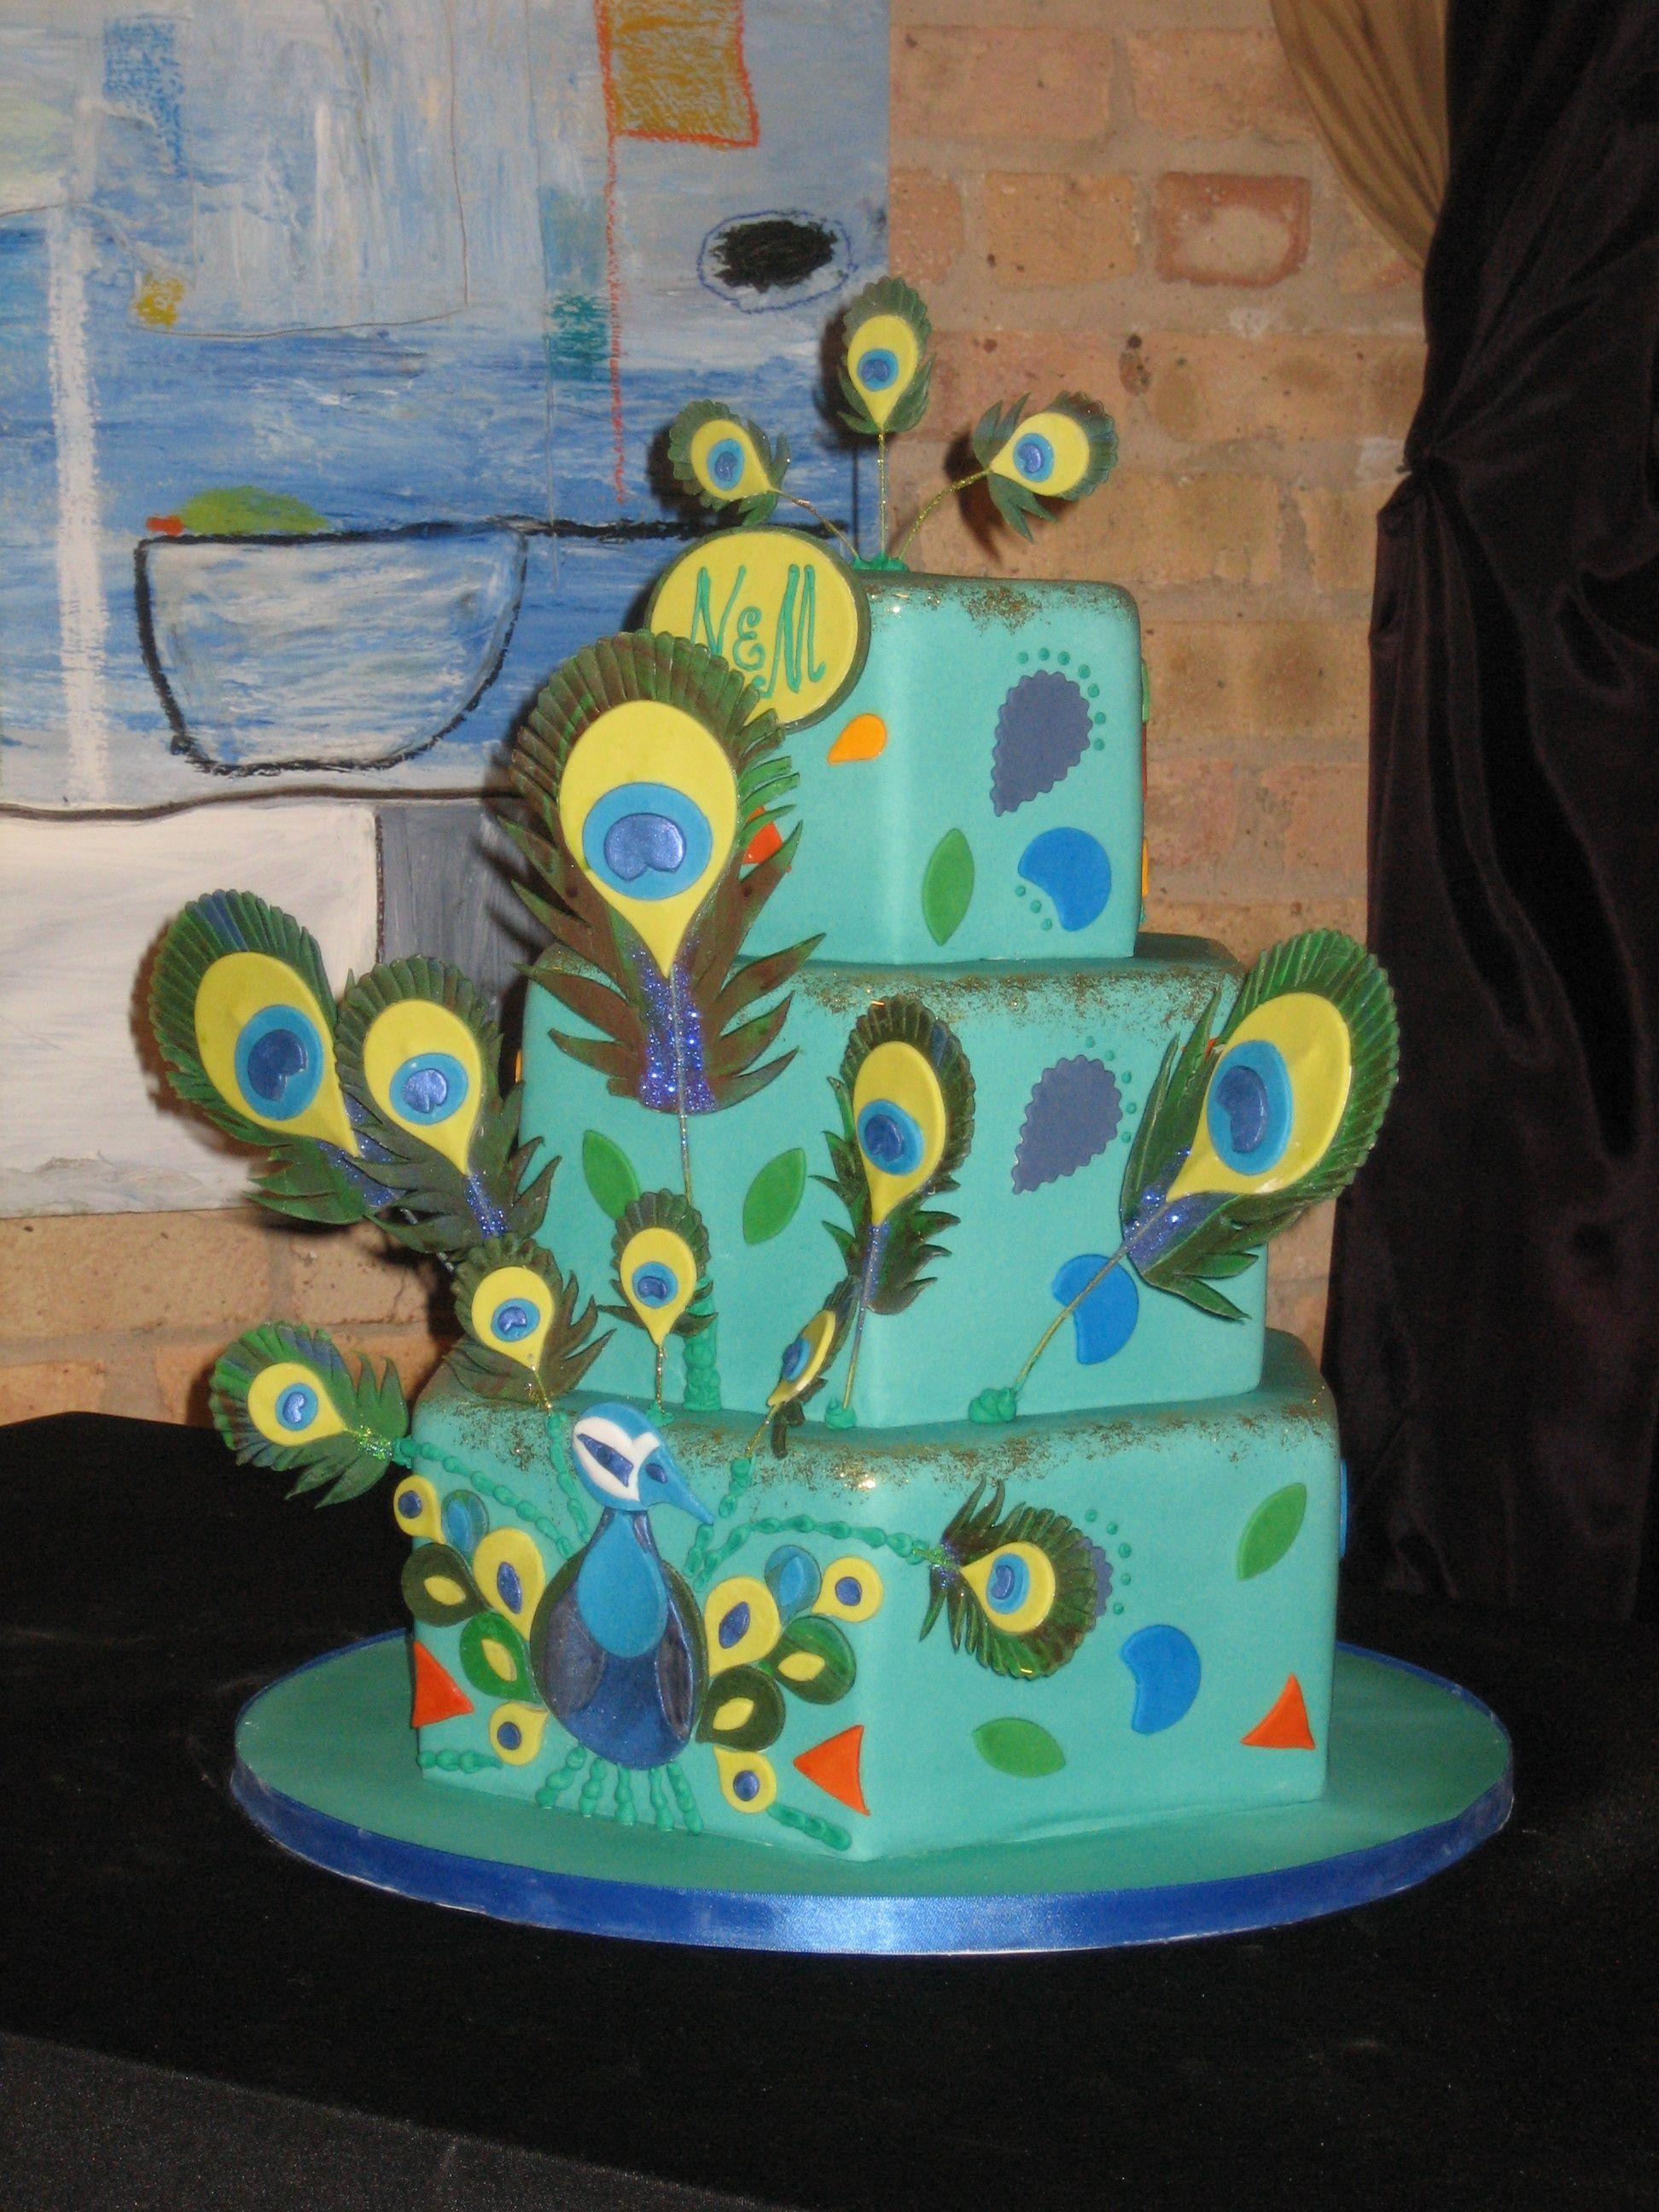 Amy Beck Cake Design - Chicago, IL - Peacock feathers birthday cake - #amybeckcakedesign